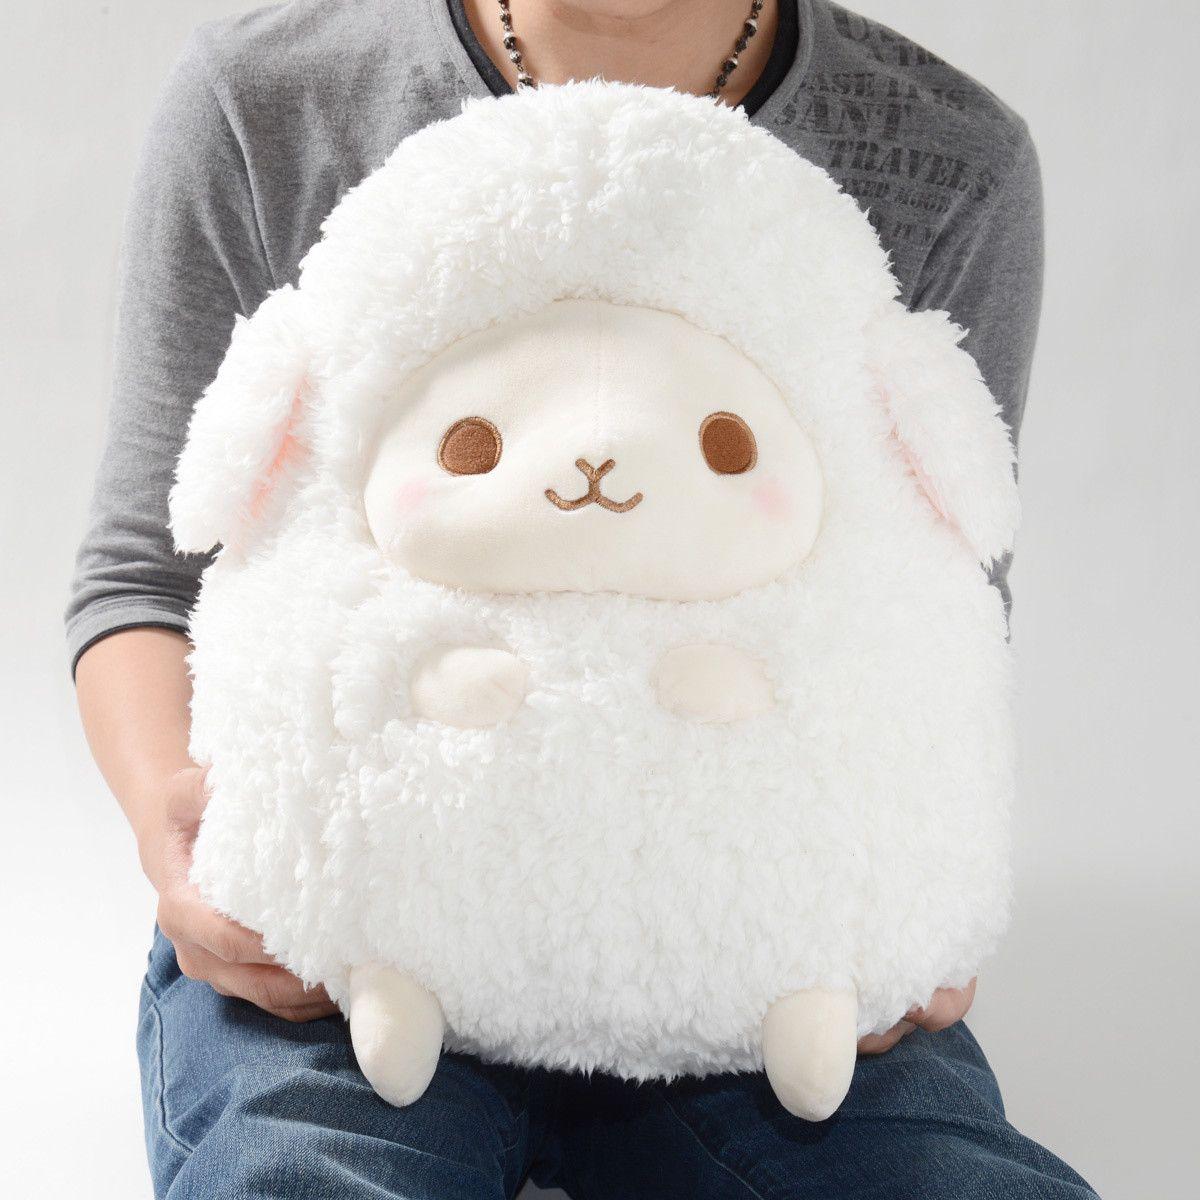 Wooly Baby Sheep Plush Collection (Big) Kawaii plush